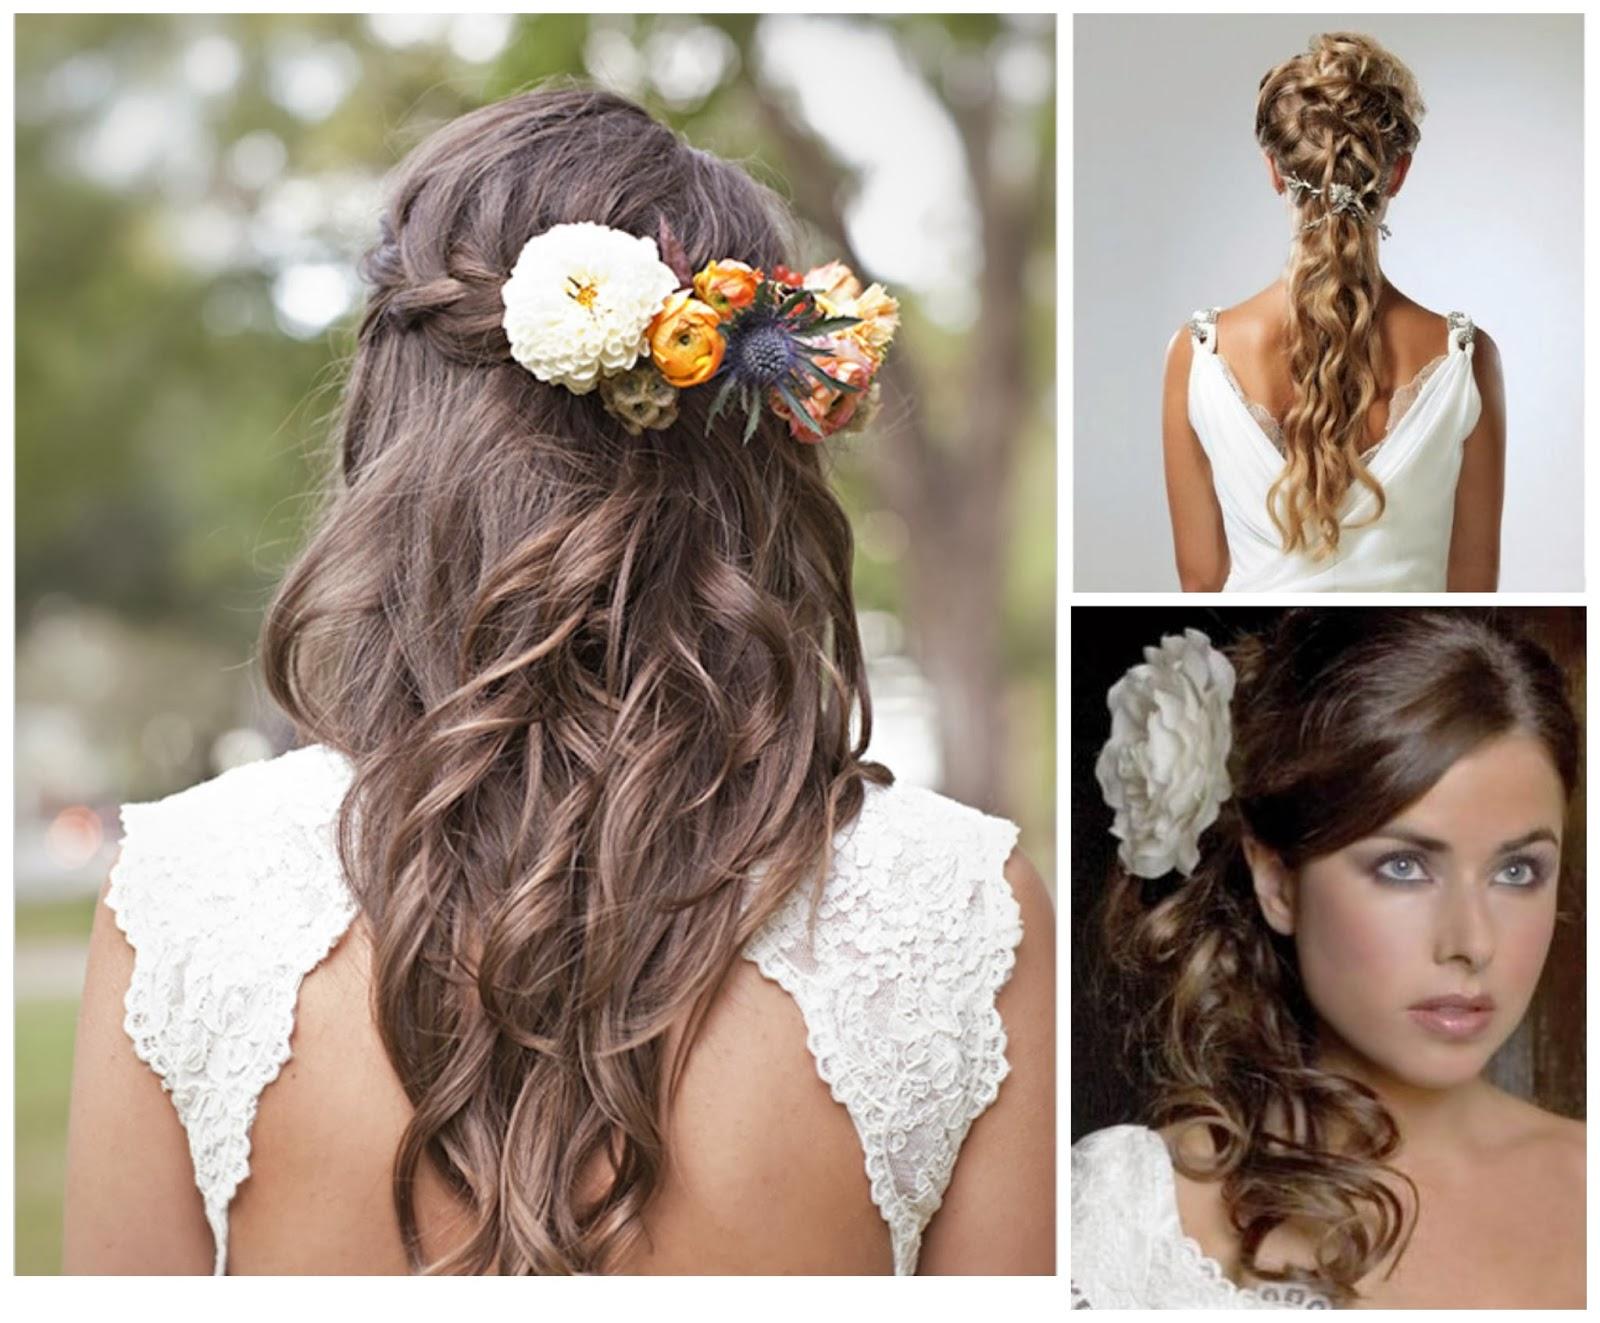 Peinados Boda Semirecogidos - Peinados fáciles para cabello corto y media melena